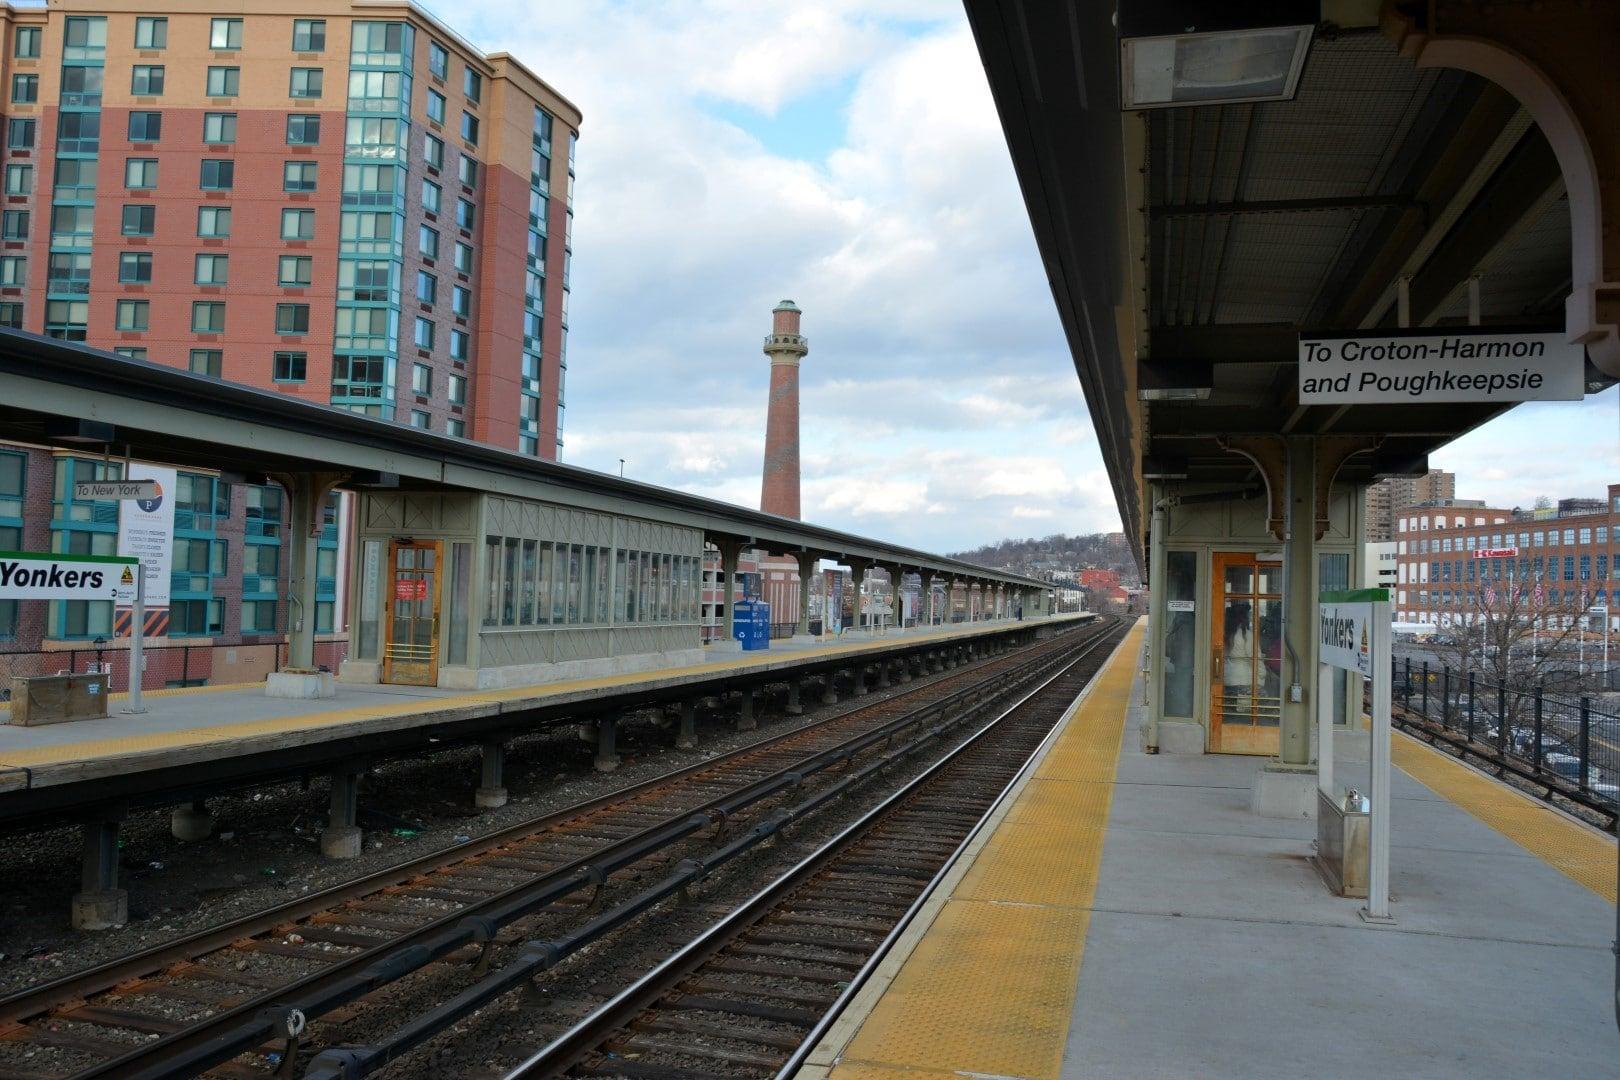 Yonkers Train Station | YNY | New York by Rail